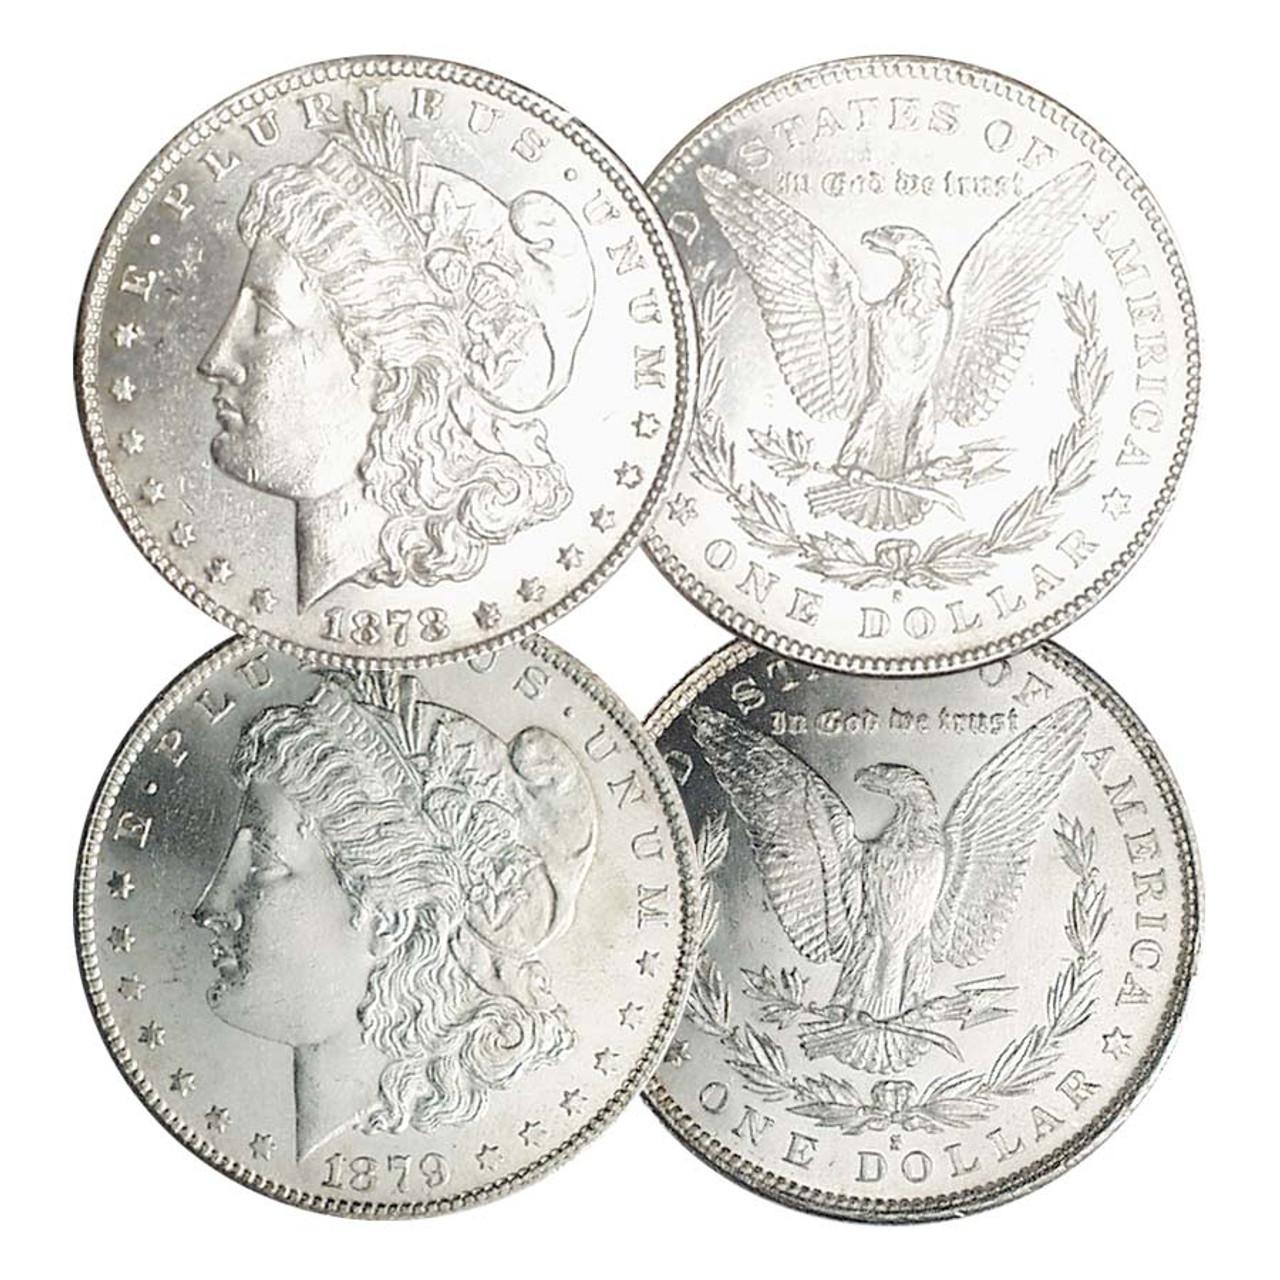 1878-S & 1879-S Morgan Silver Dollar Pair Brilliant Uncirculated